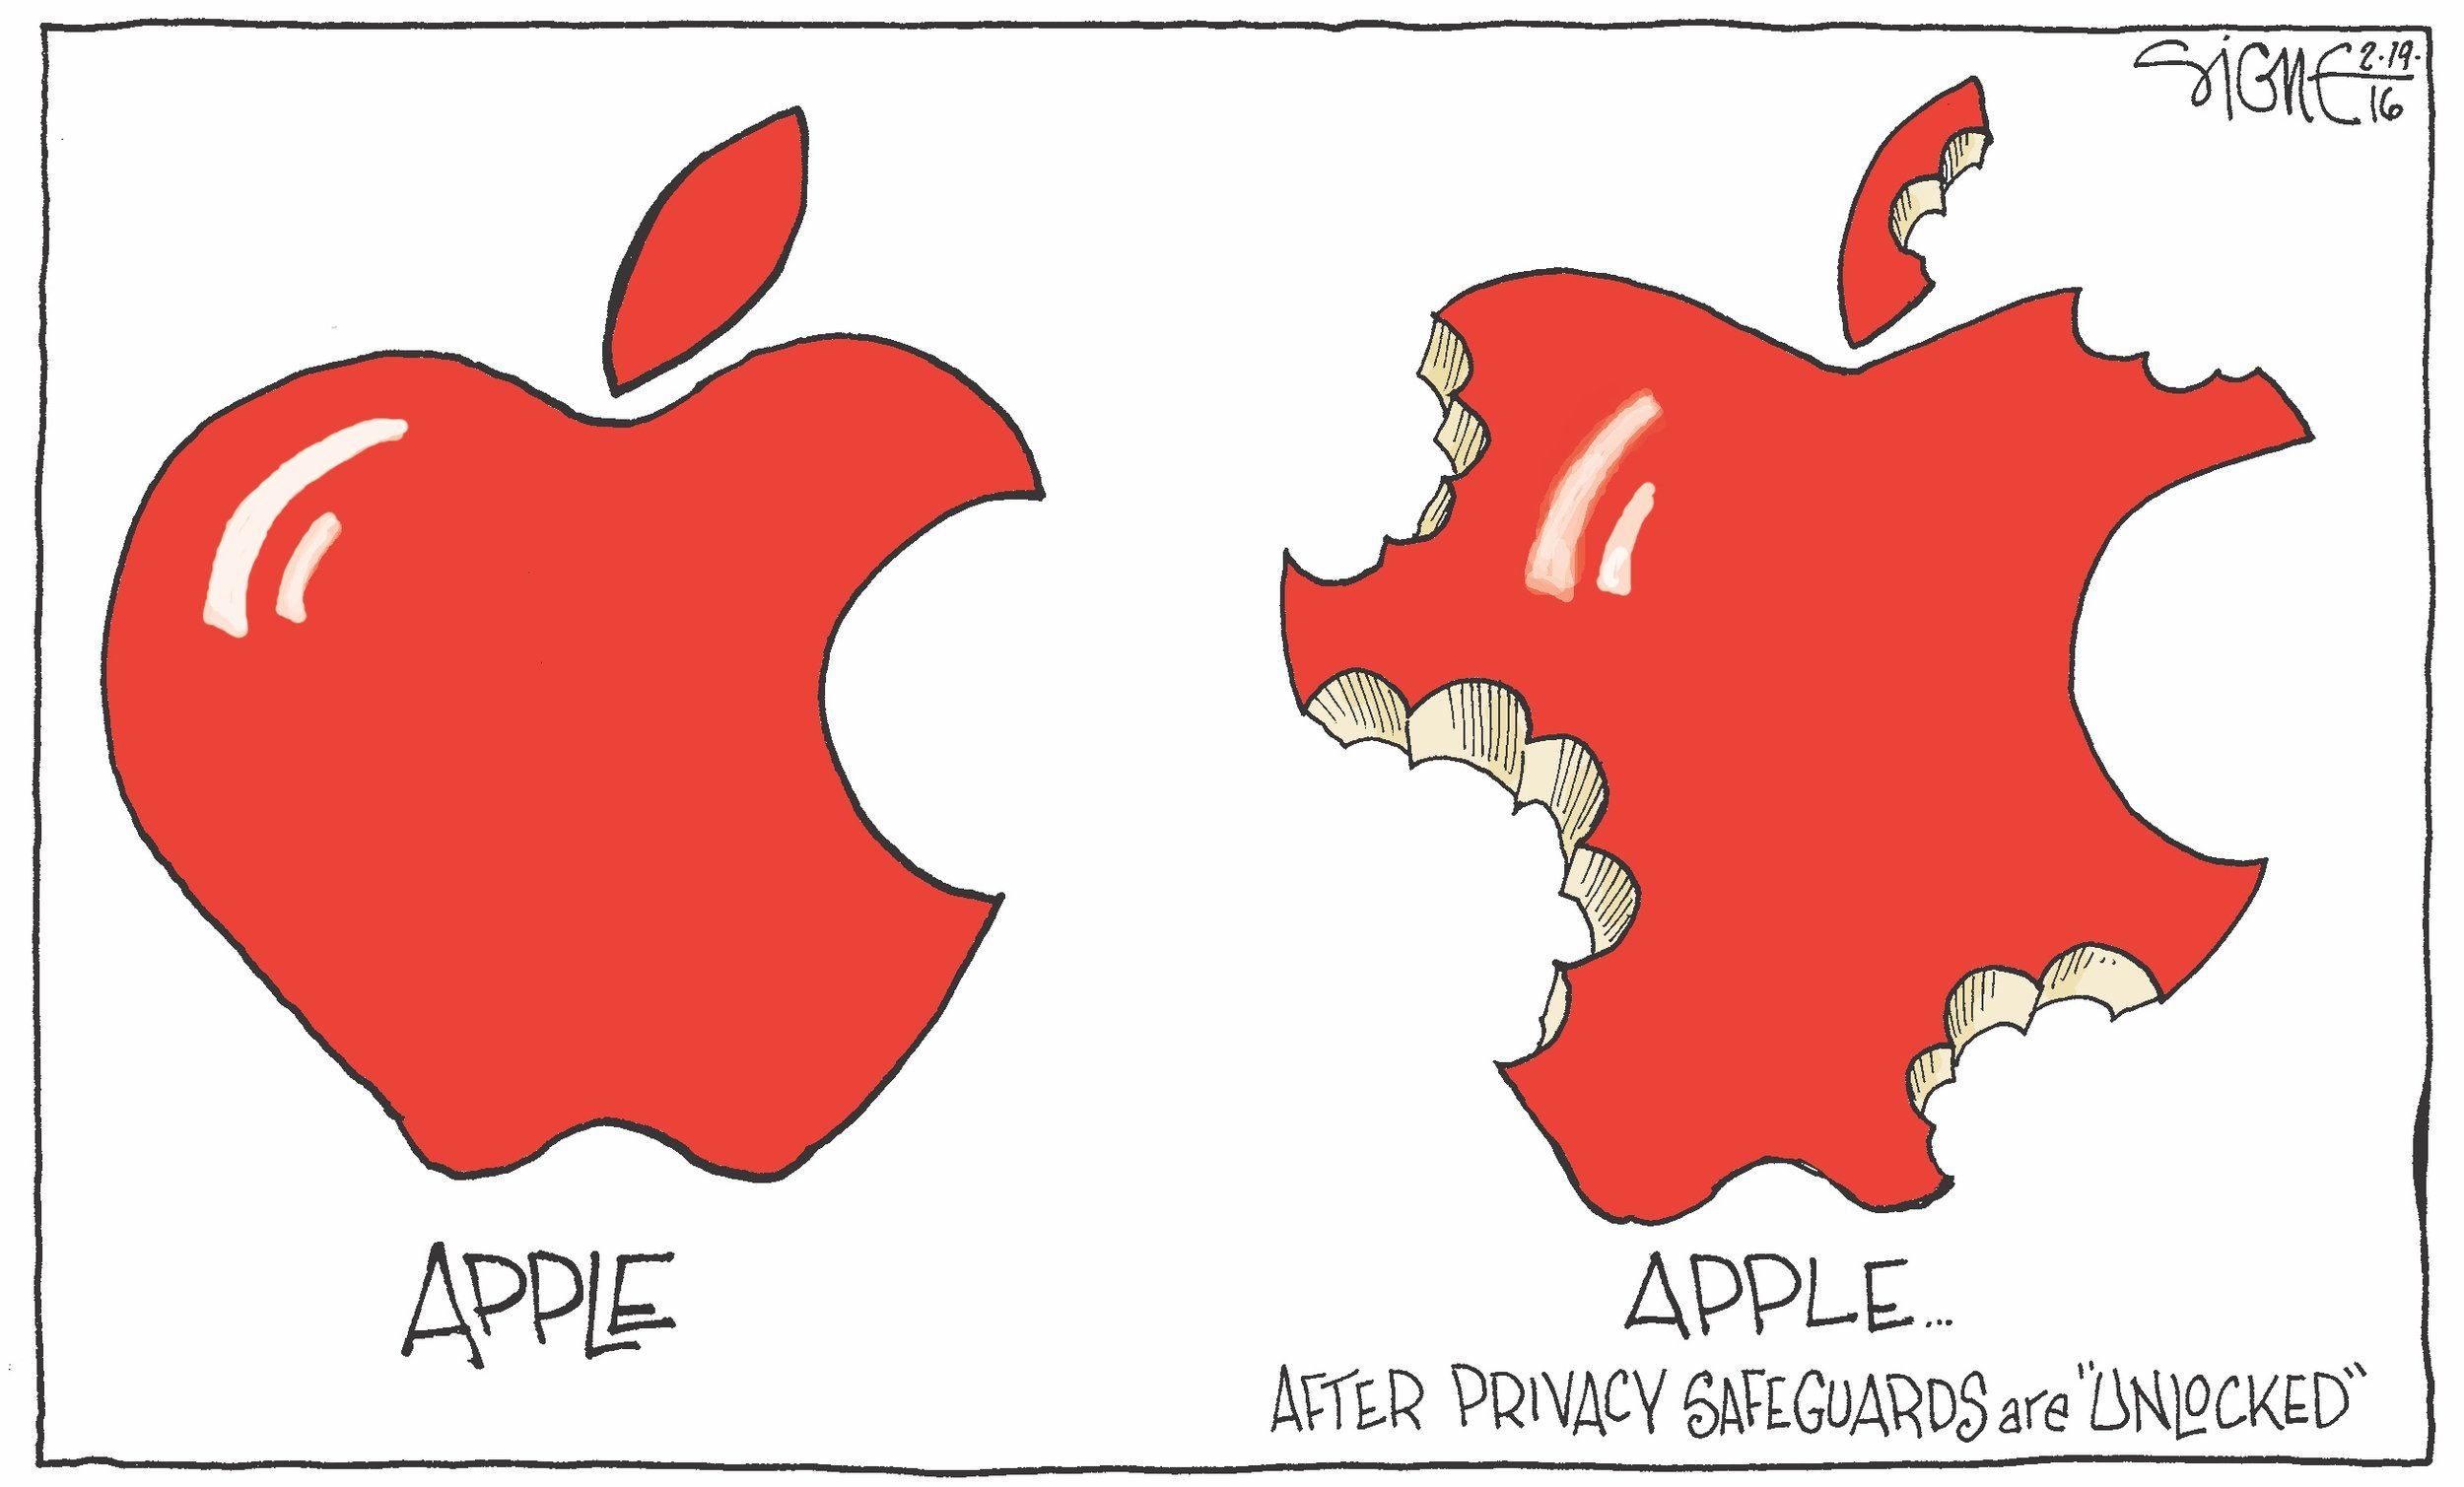 02-19-16 Apple.jpg